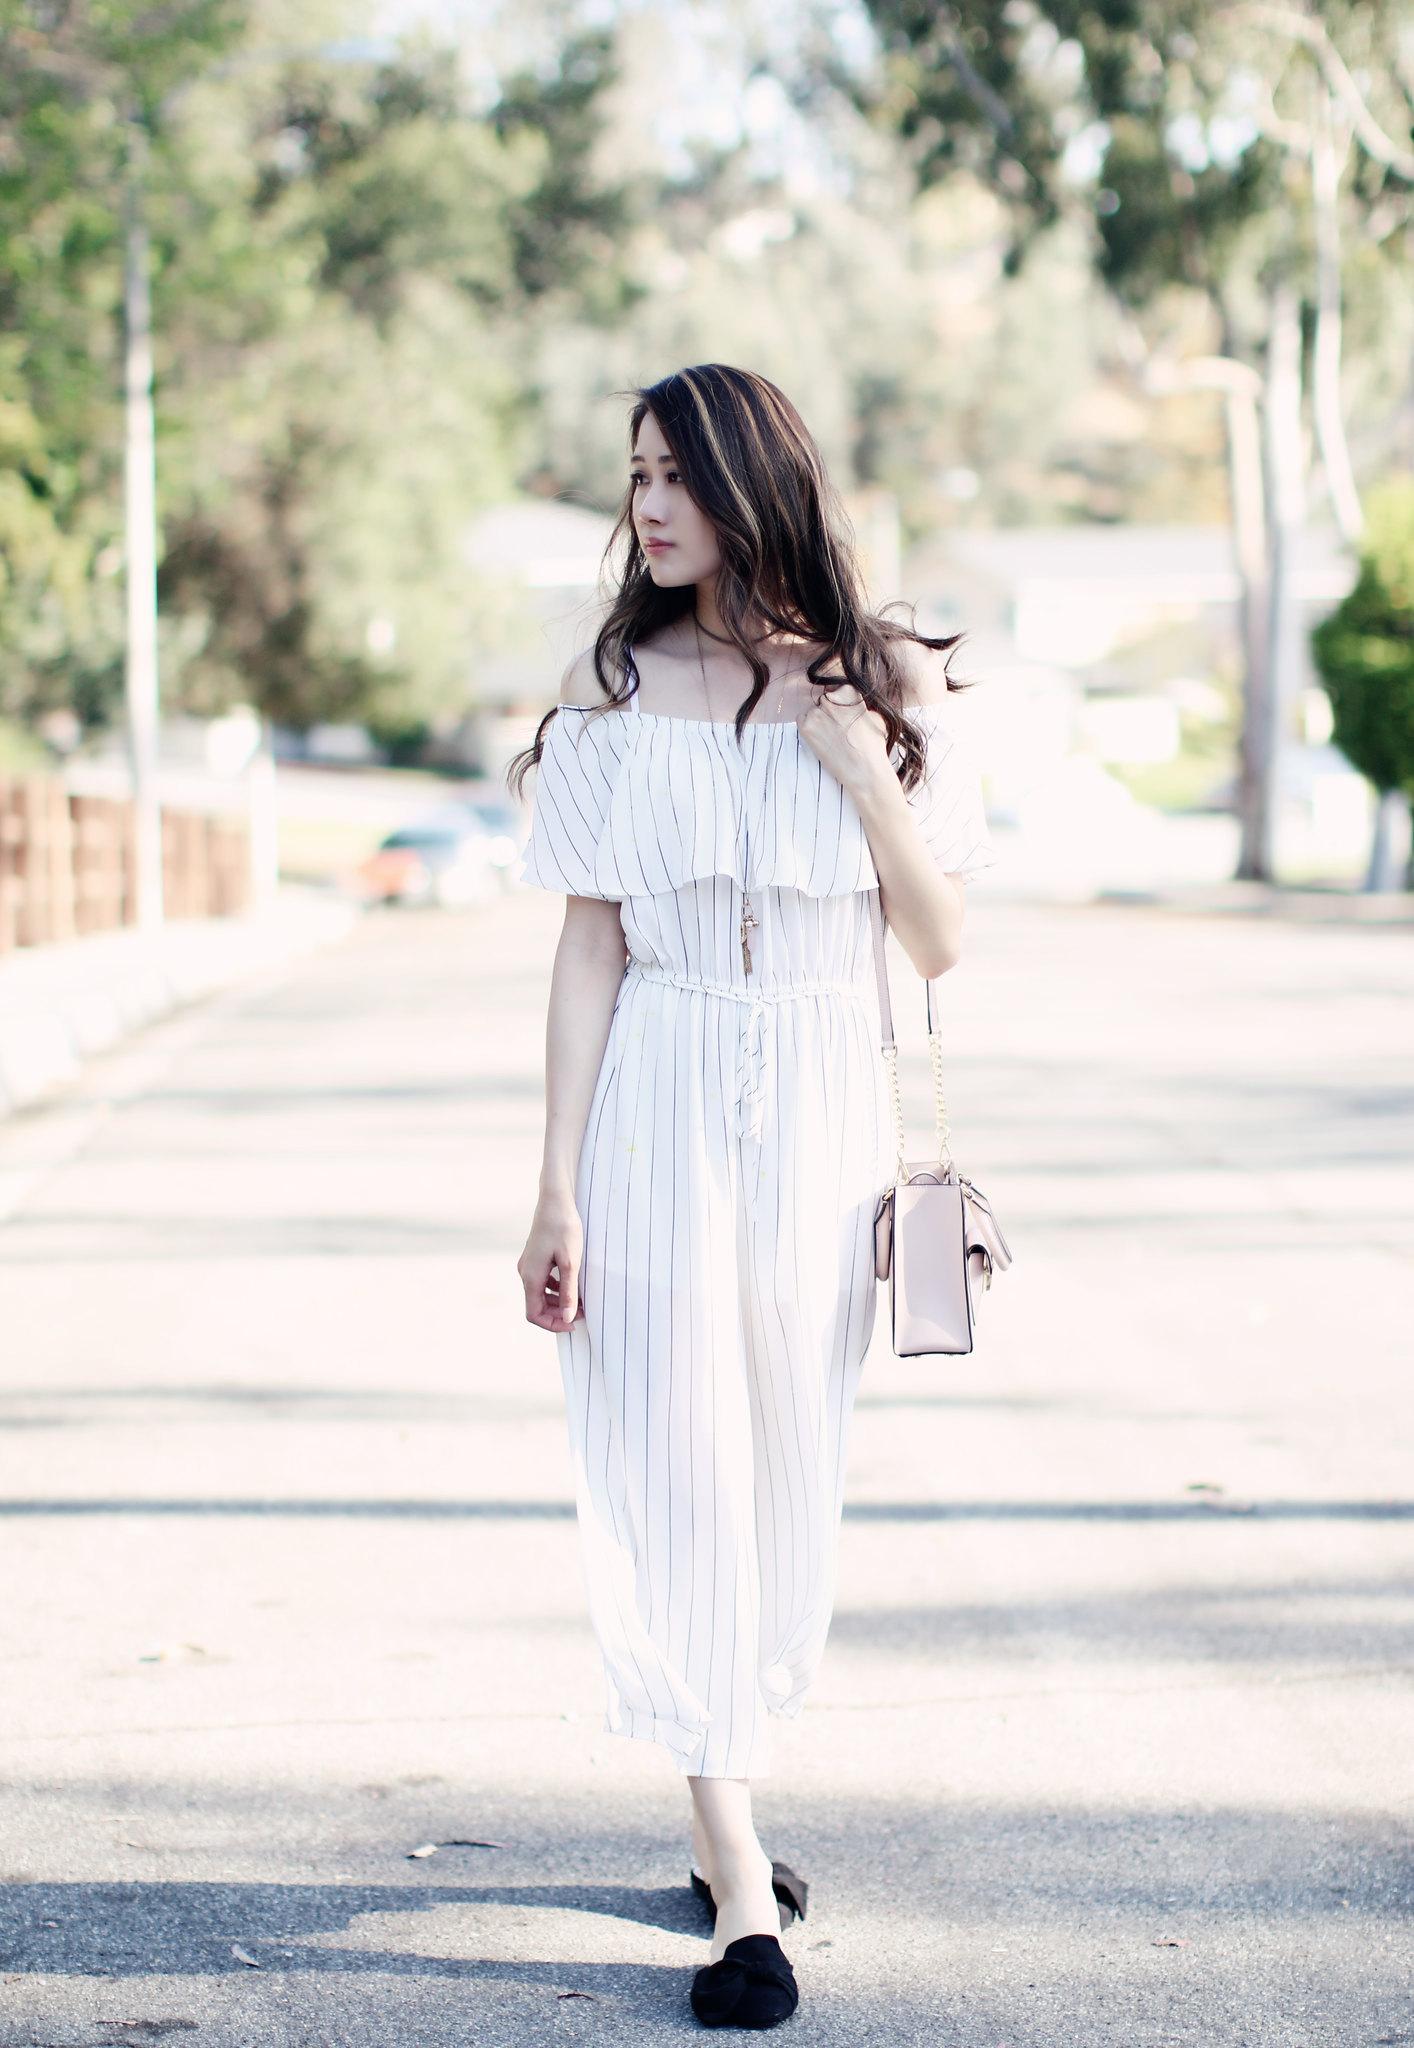 5260-ootd-fashion-style-outfitoftheday-wiwt-streetstyle-owlxfish-f21xme-romper-jumpsuit-bohochic-bershka-zara-summer-elizabeeetht-clothestoyouuu